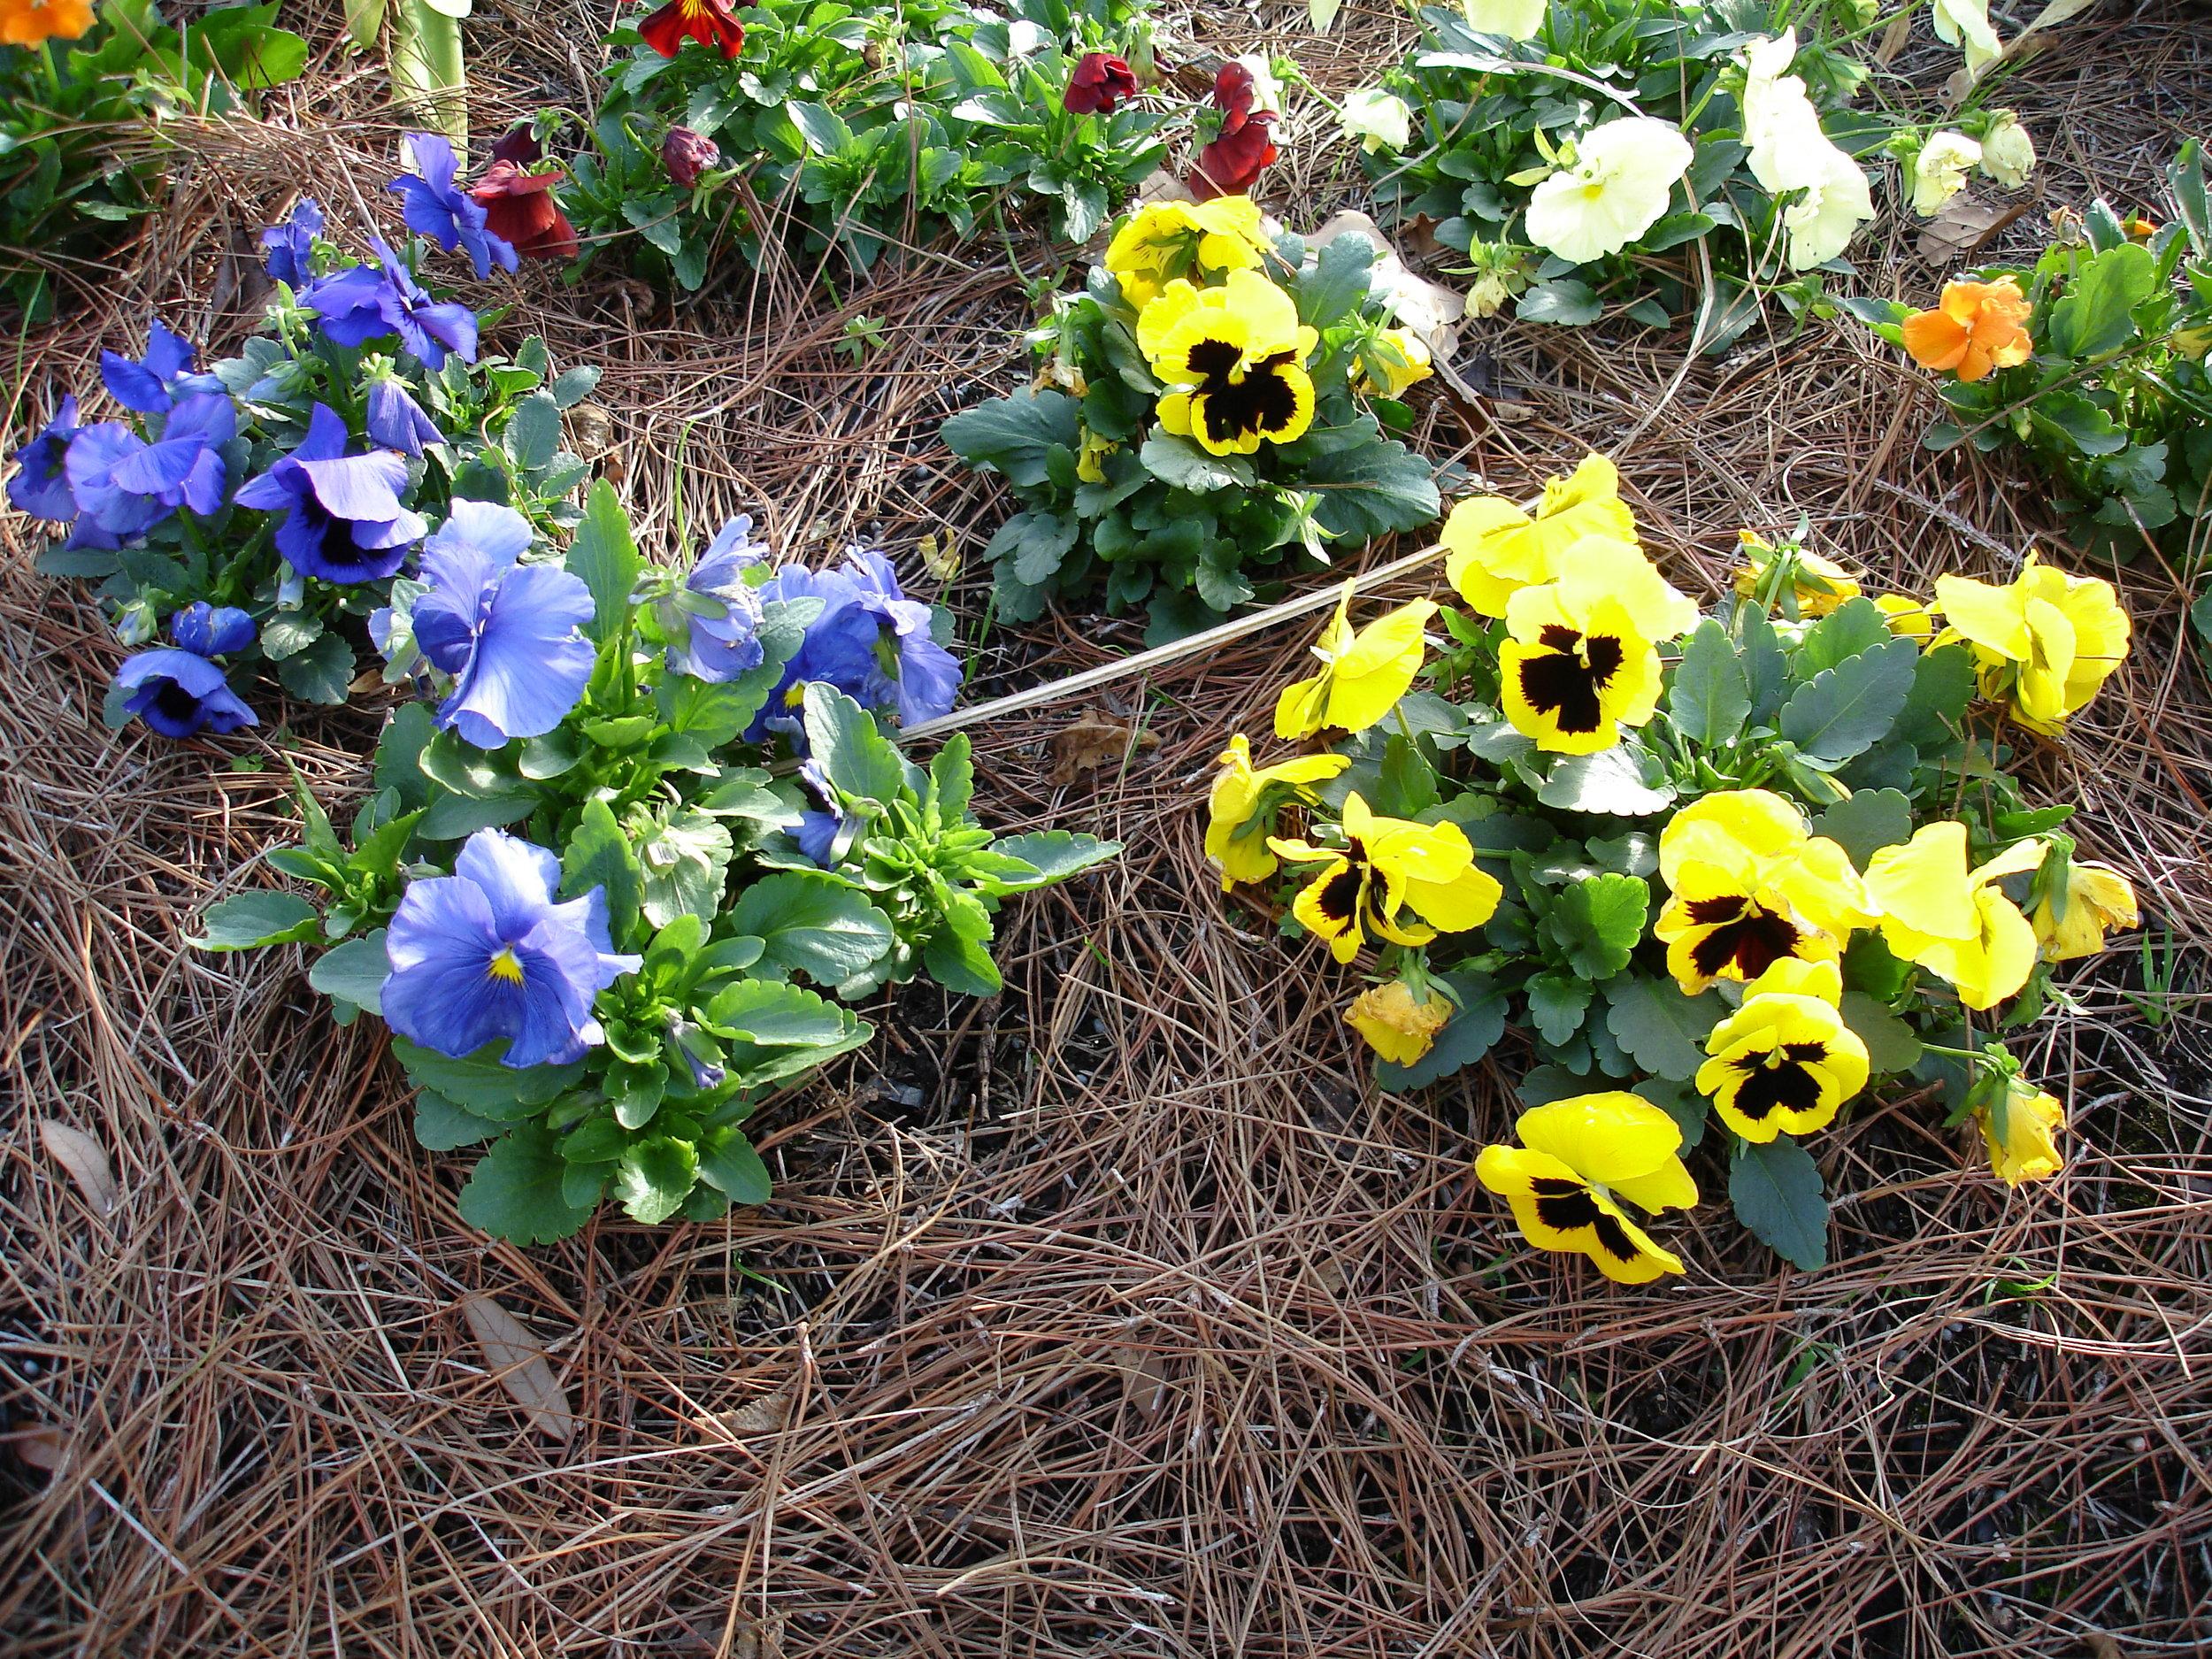 annuals-seasonal-color-baton-rouge-area (1).jpg